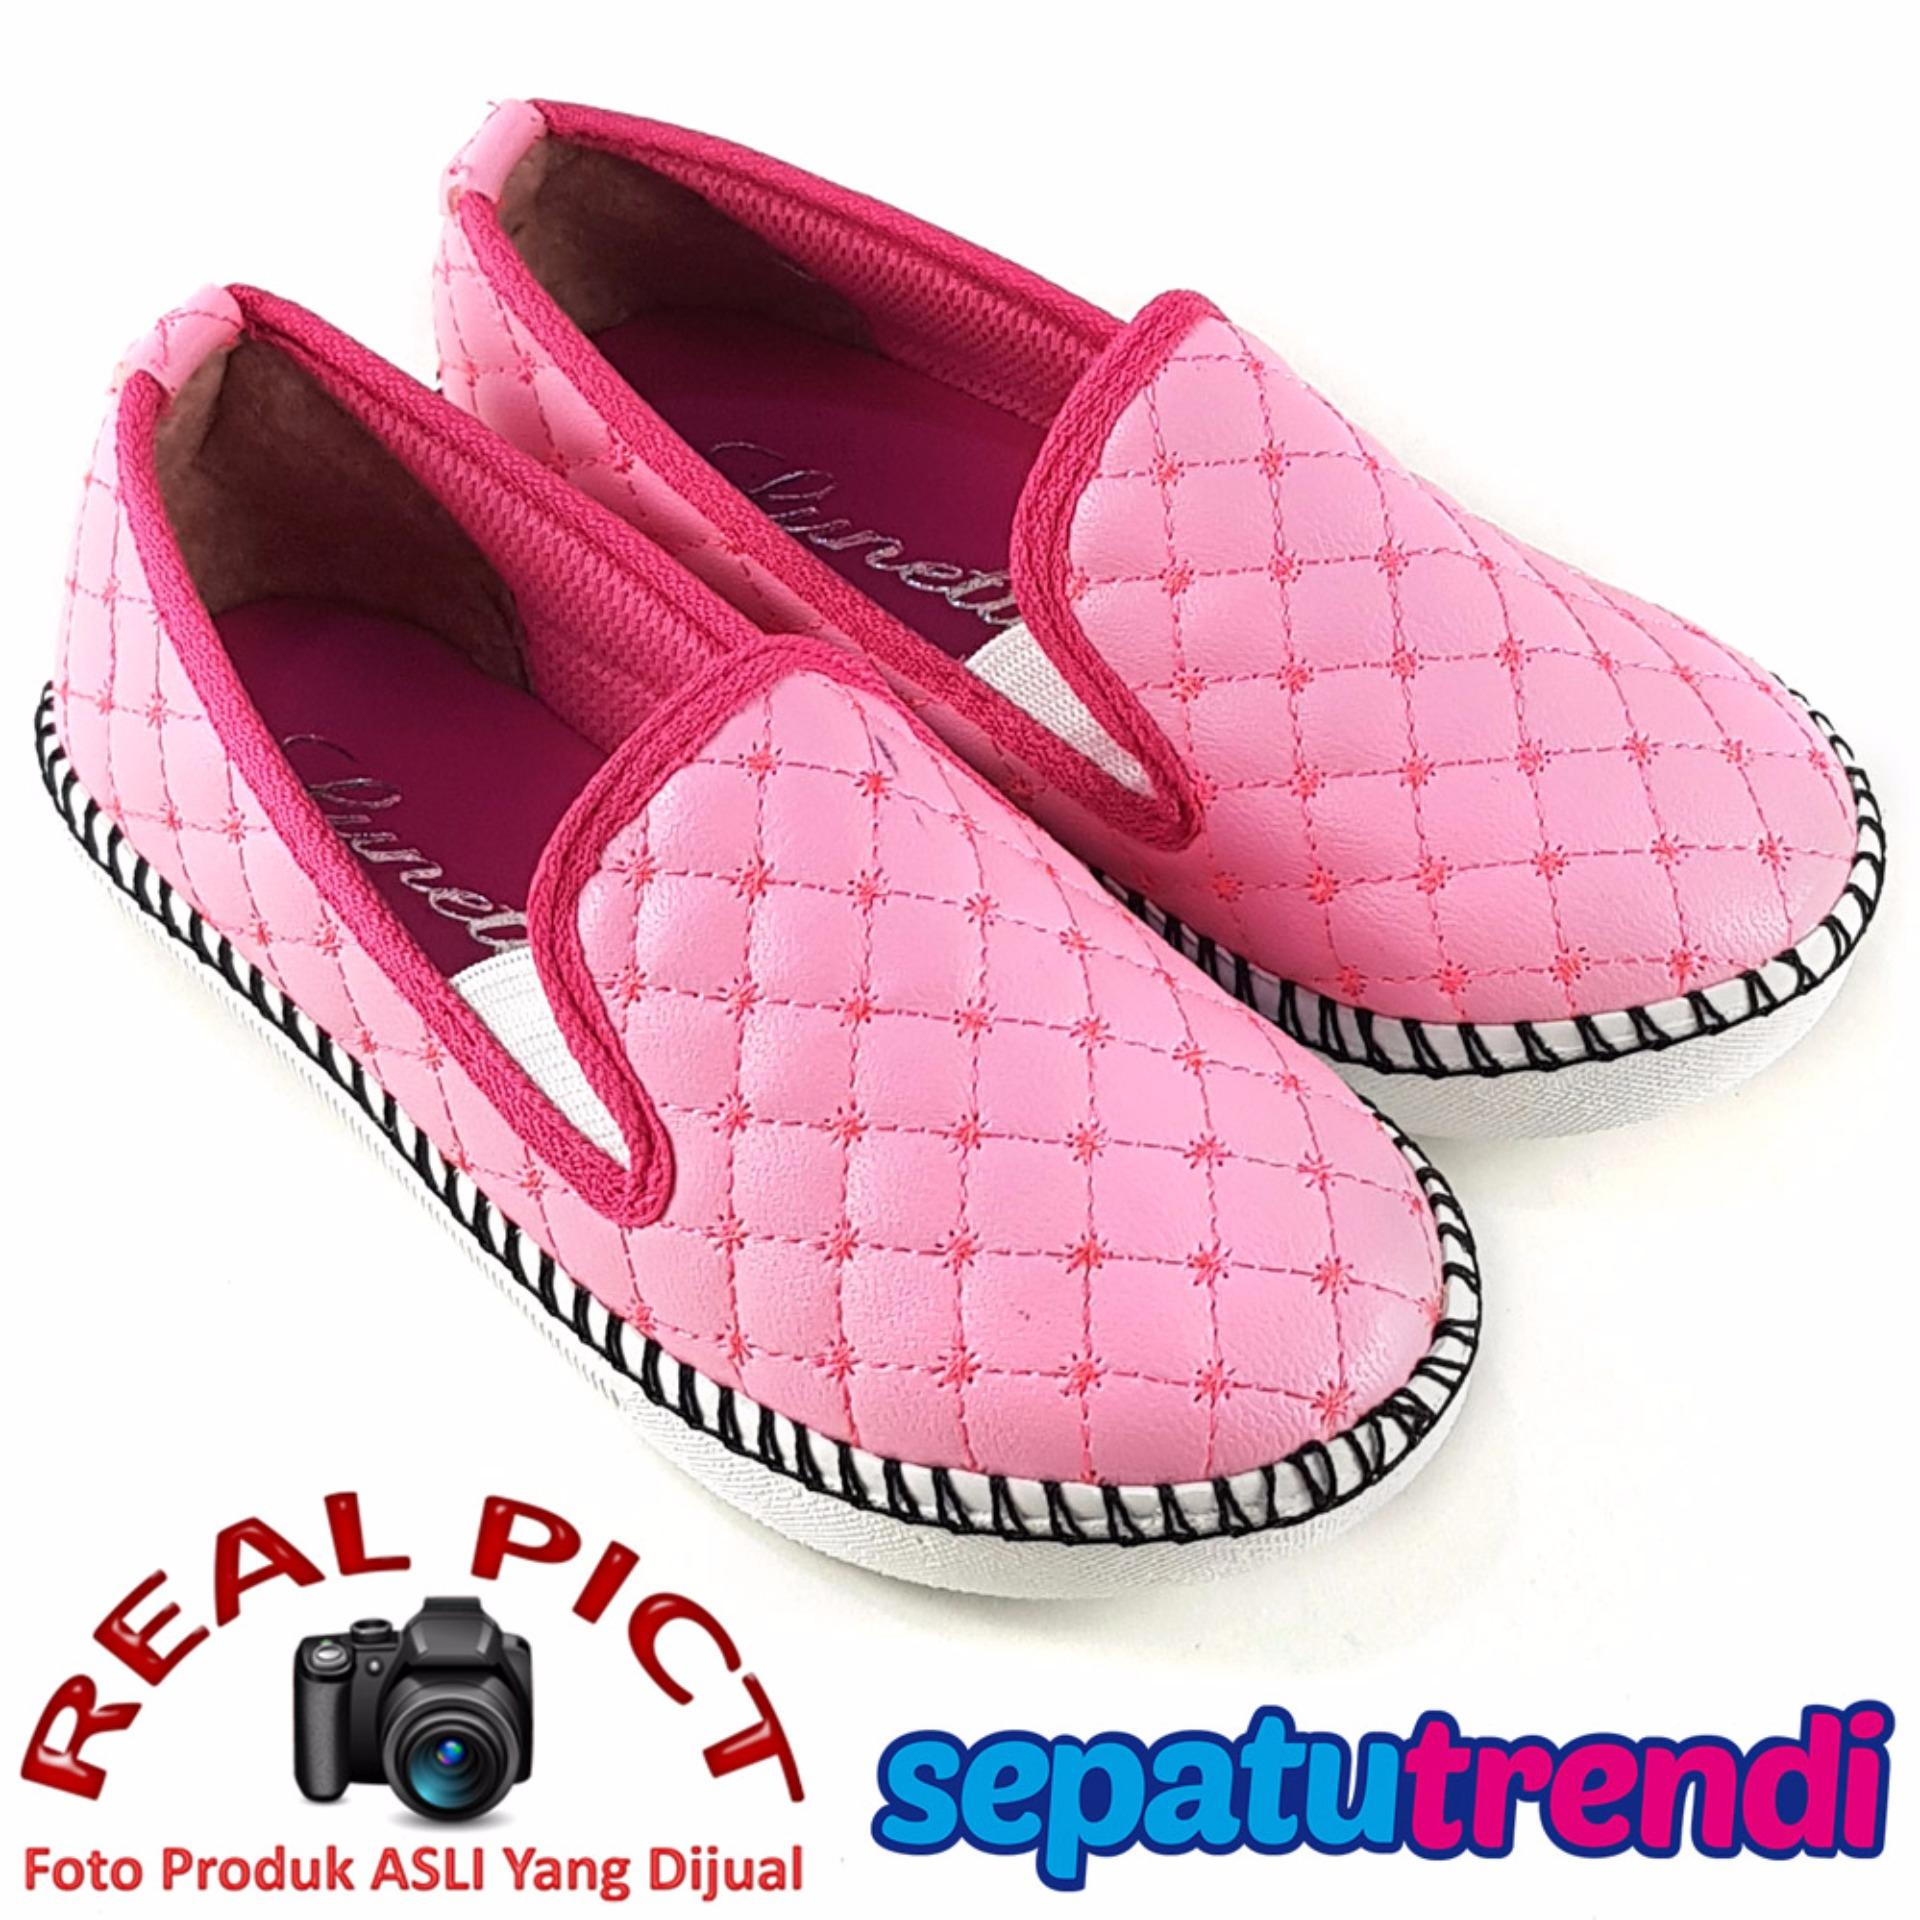 Jual Lunetta Sepatu Anak Perempuan Slip On Sol Rajut Rjag Pink Original